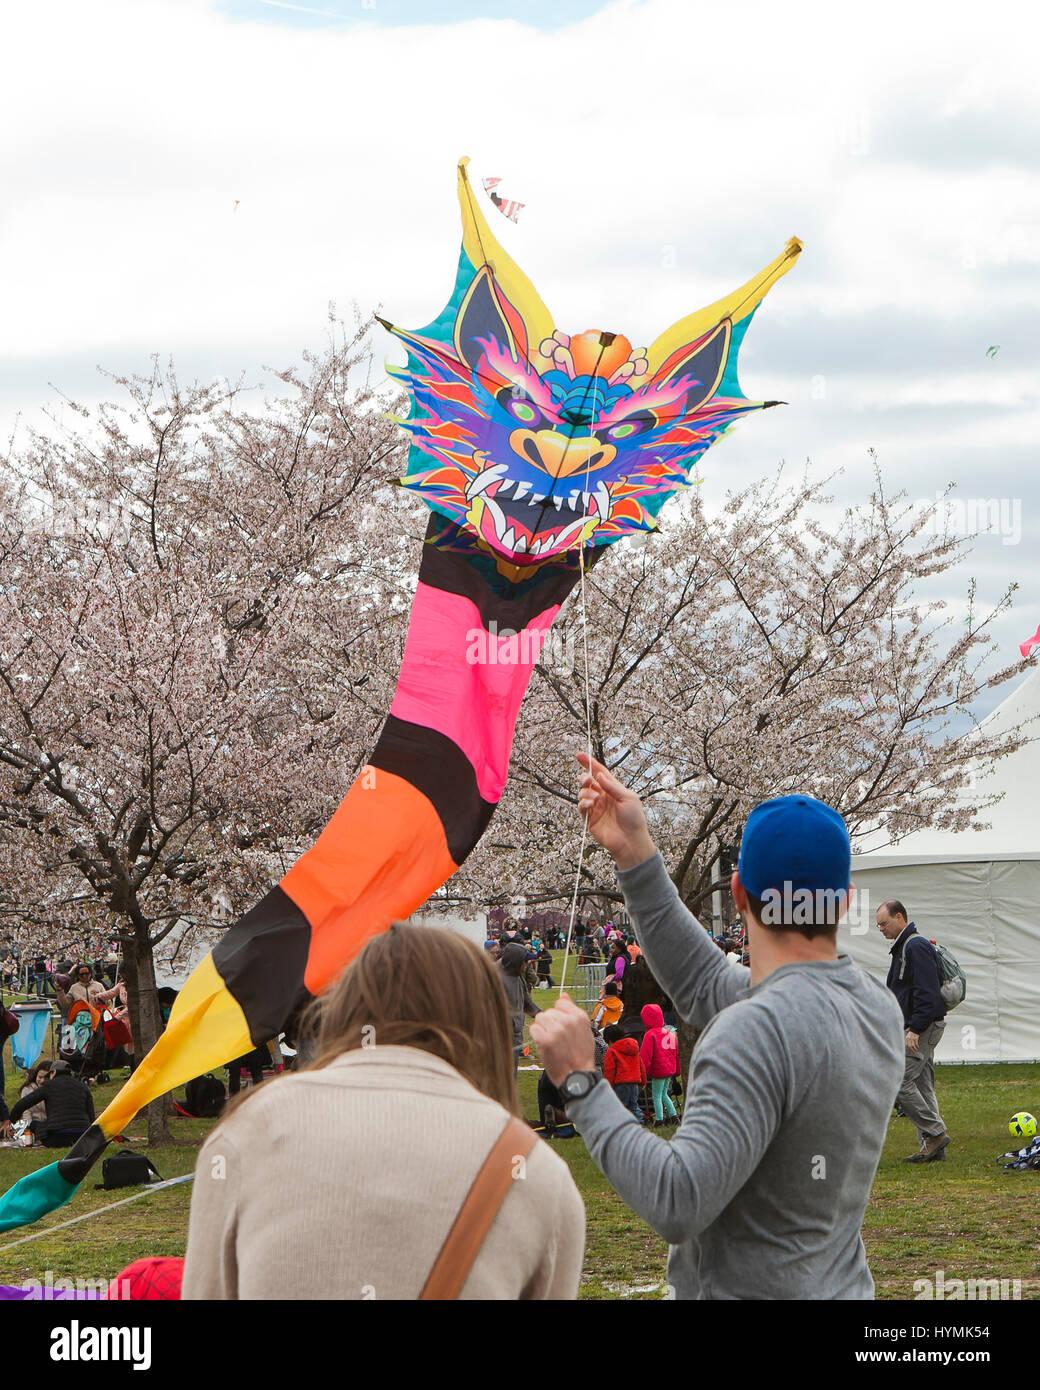 People flying kites on the National Mall during 2017 National Kite festival - Washington, DC USA - Stock Image